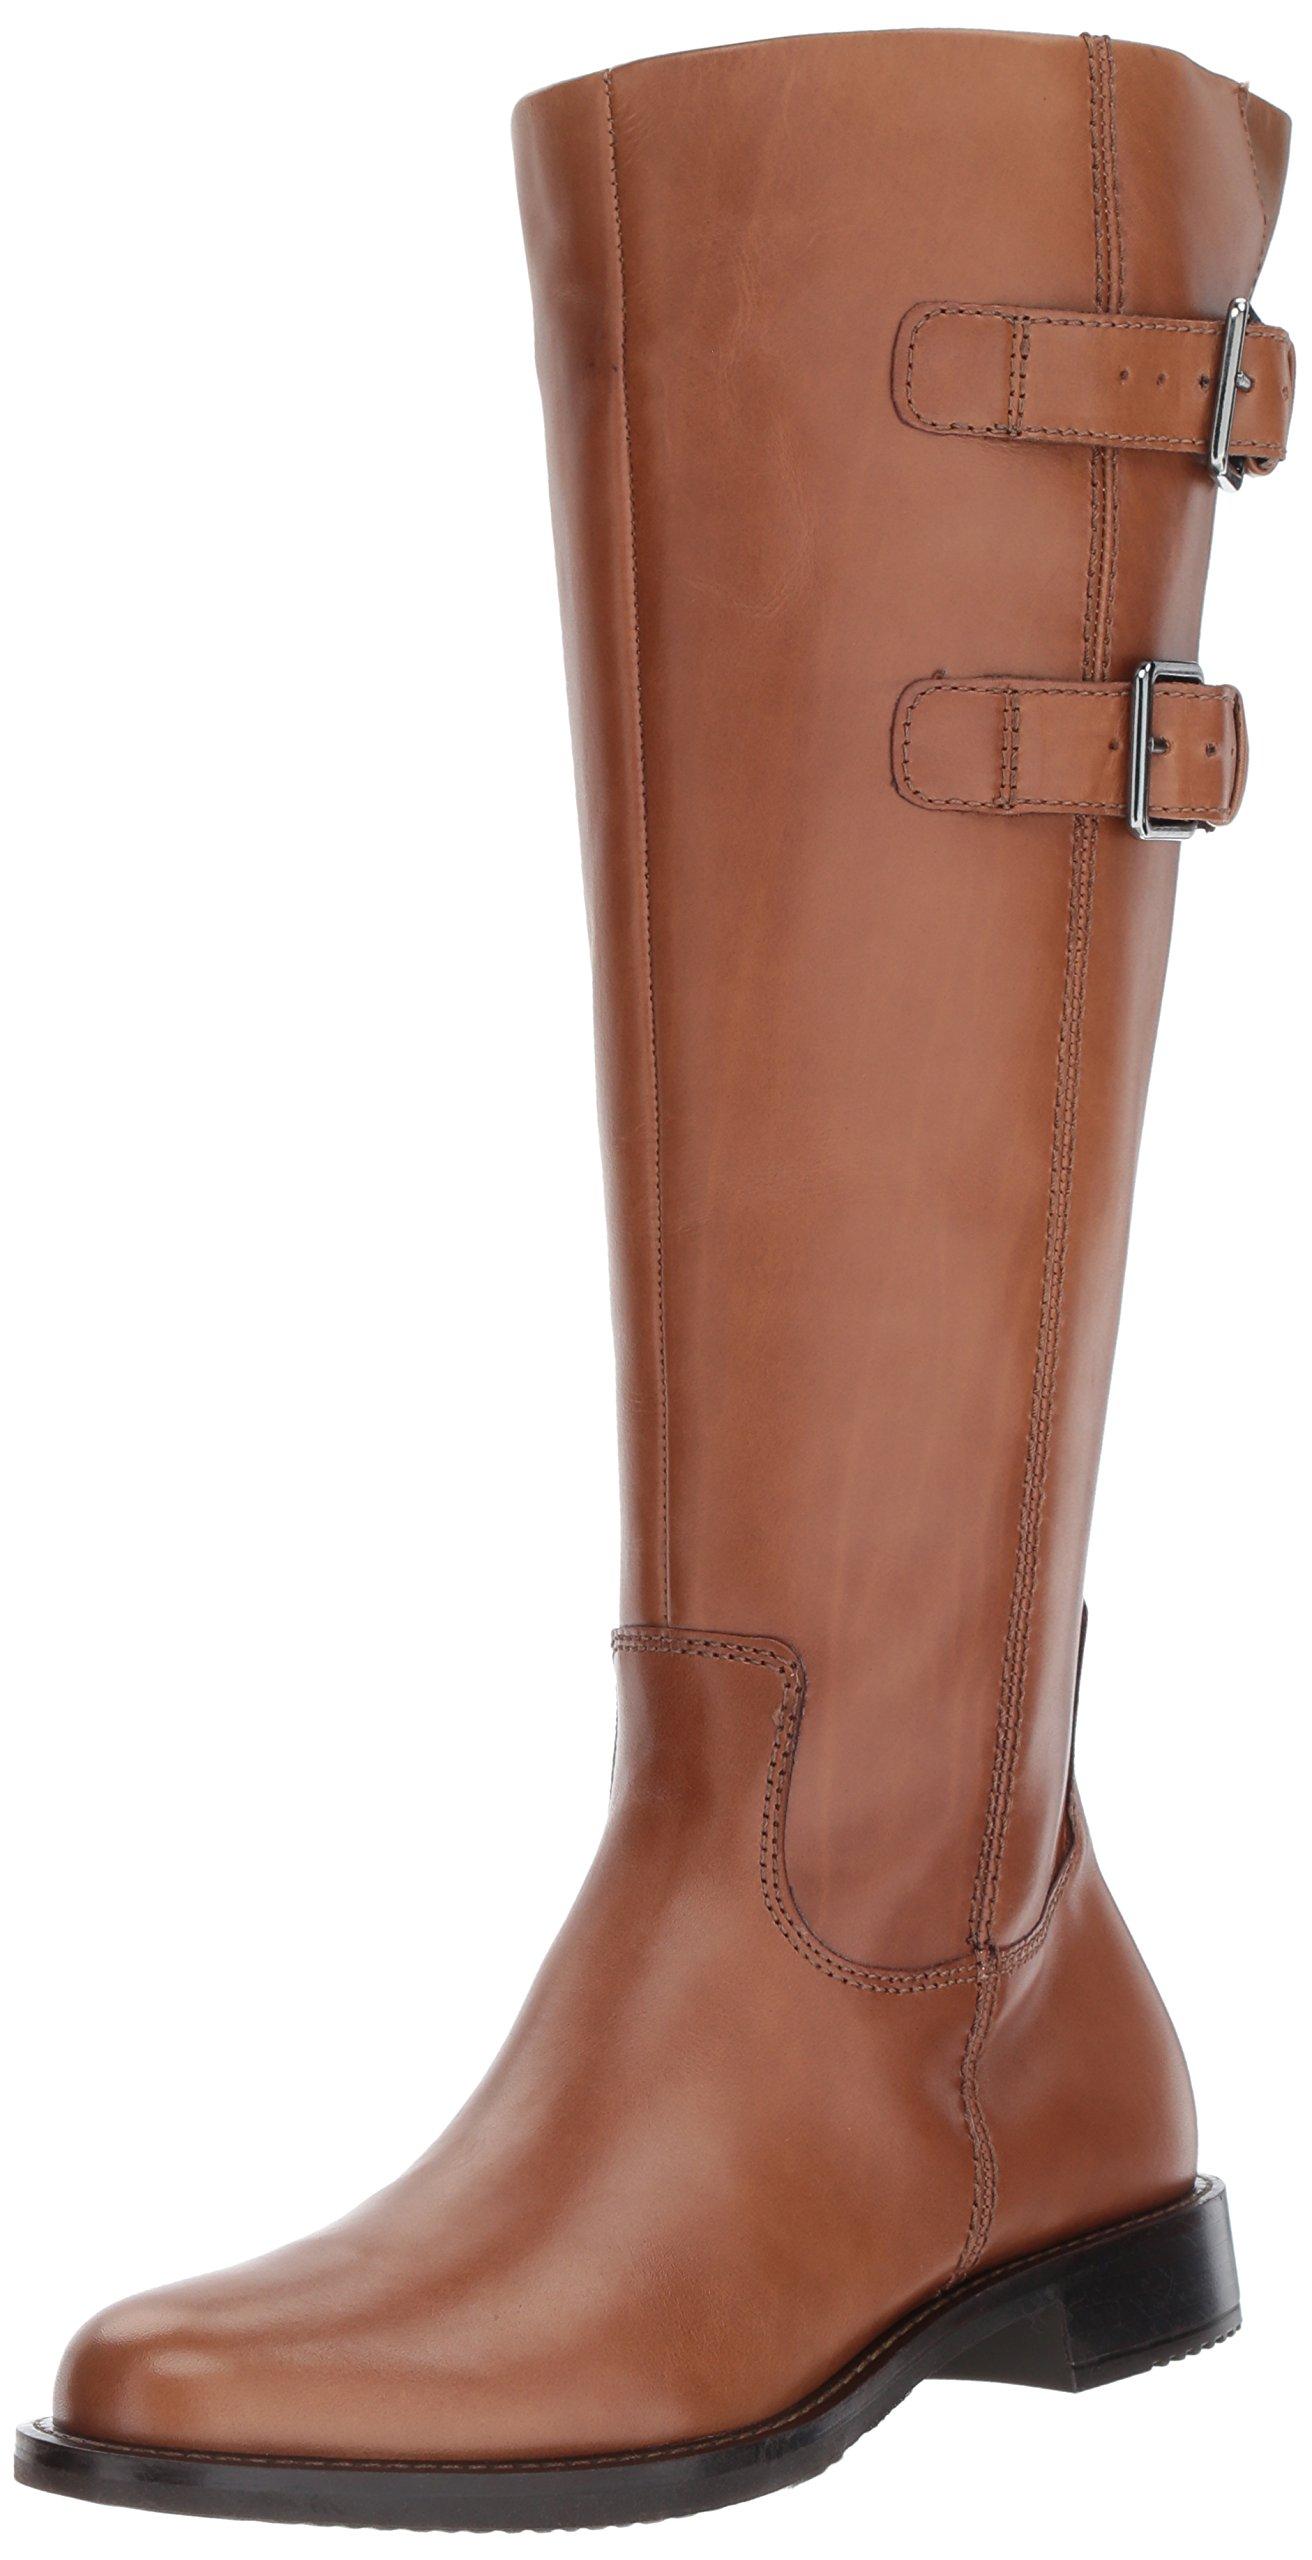 ECCO Women's Shape 25 Tall Buckle Riding Boot,Camel,38 EU/7-7.5 M US